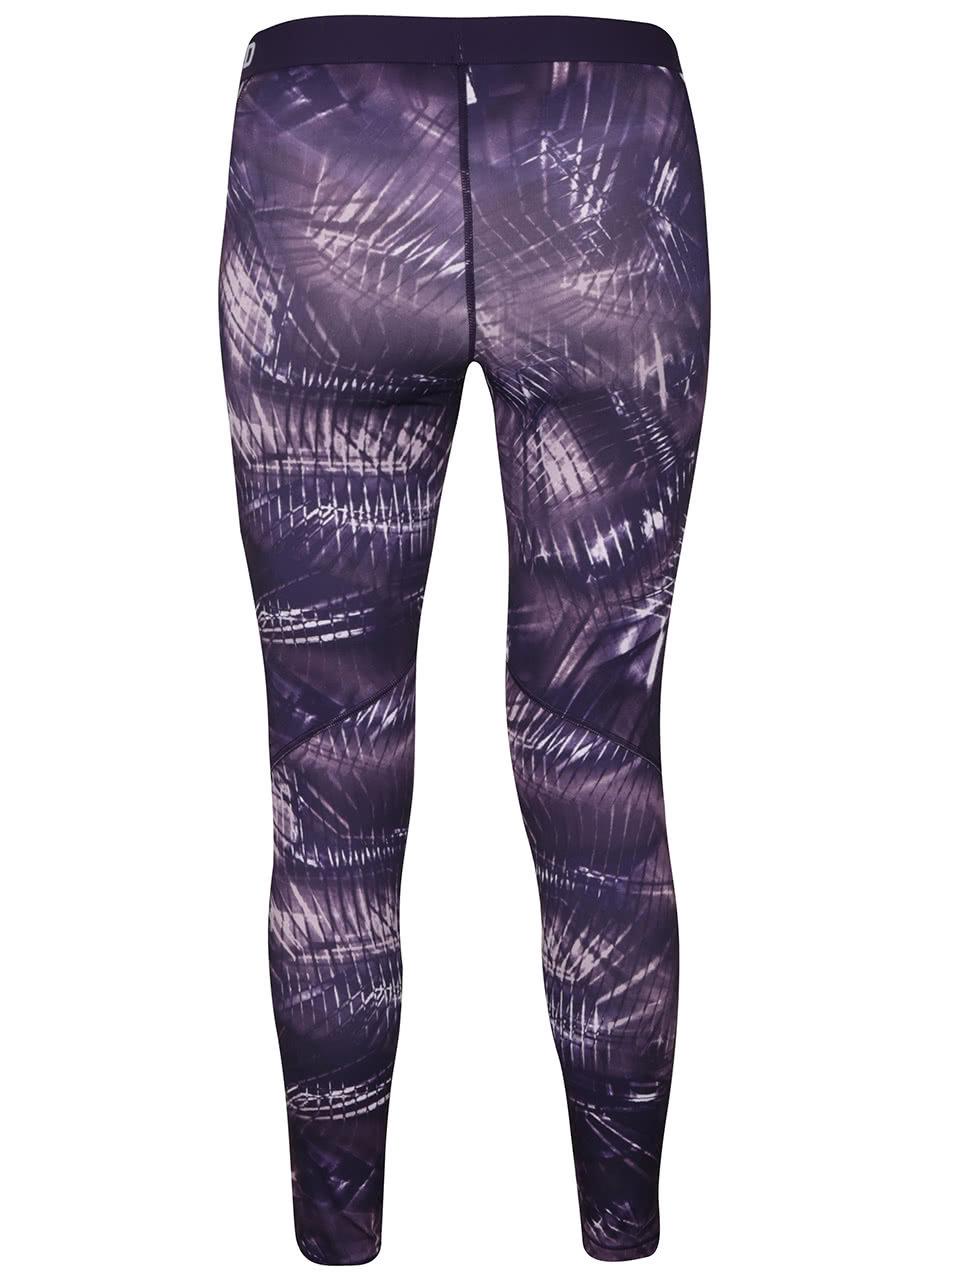 Fialové dámské legíny Nike Pro Warm Tight ... 953dfd43ba